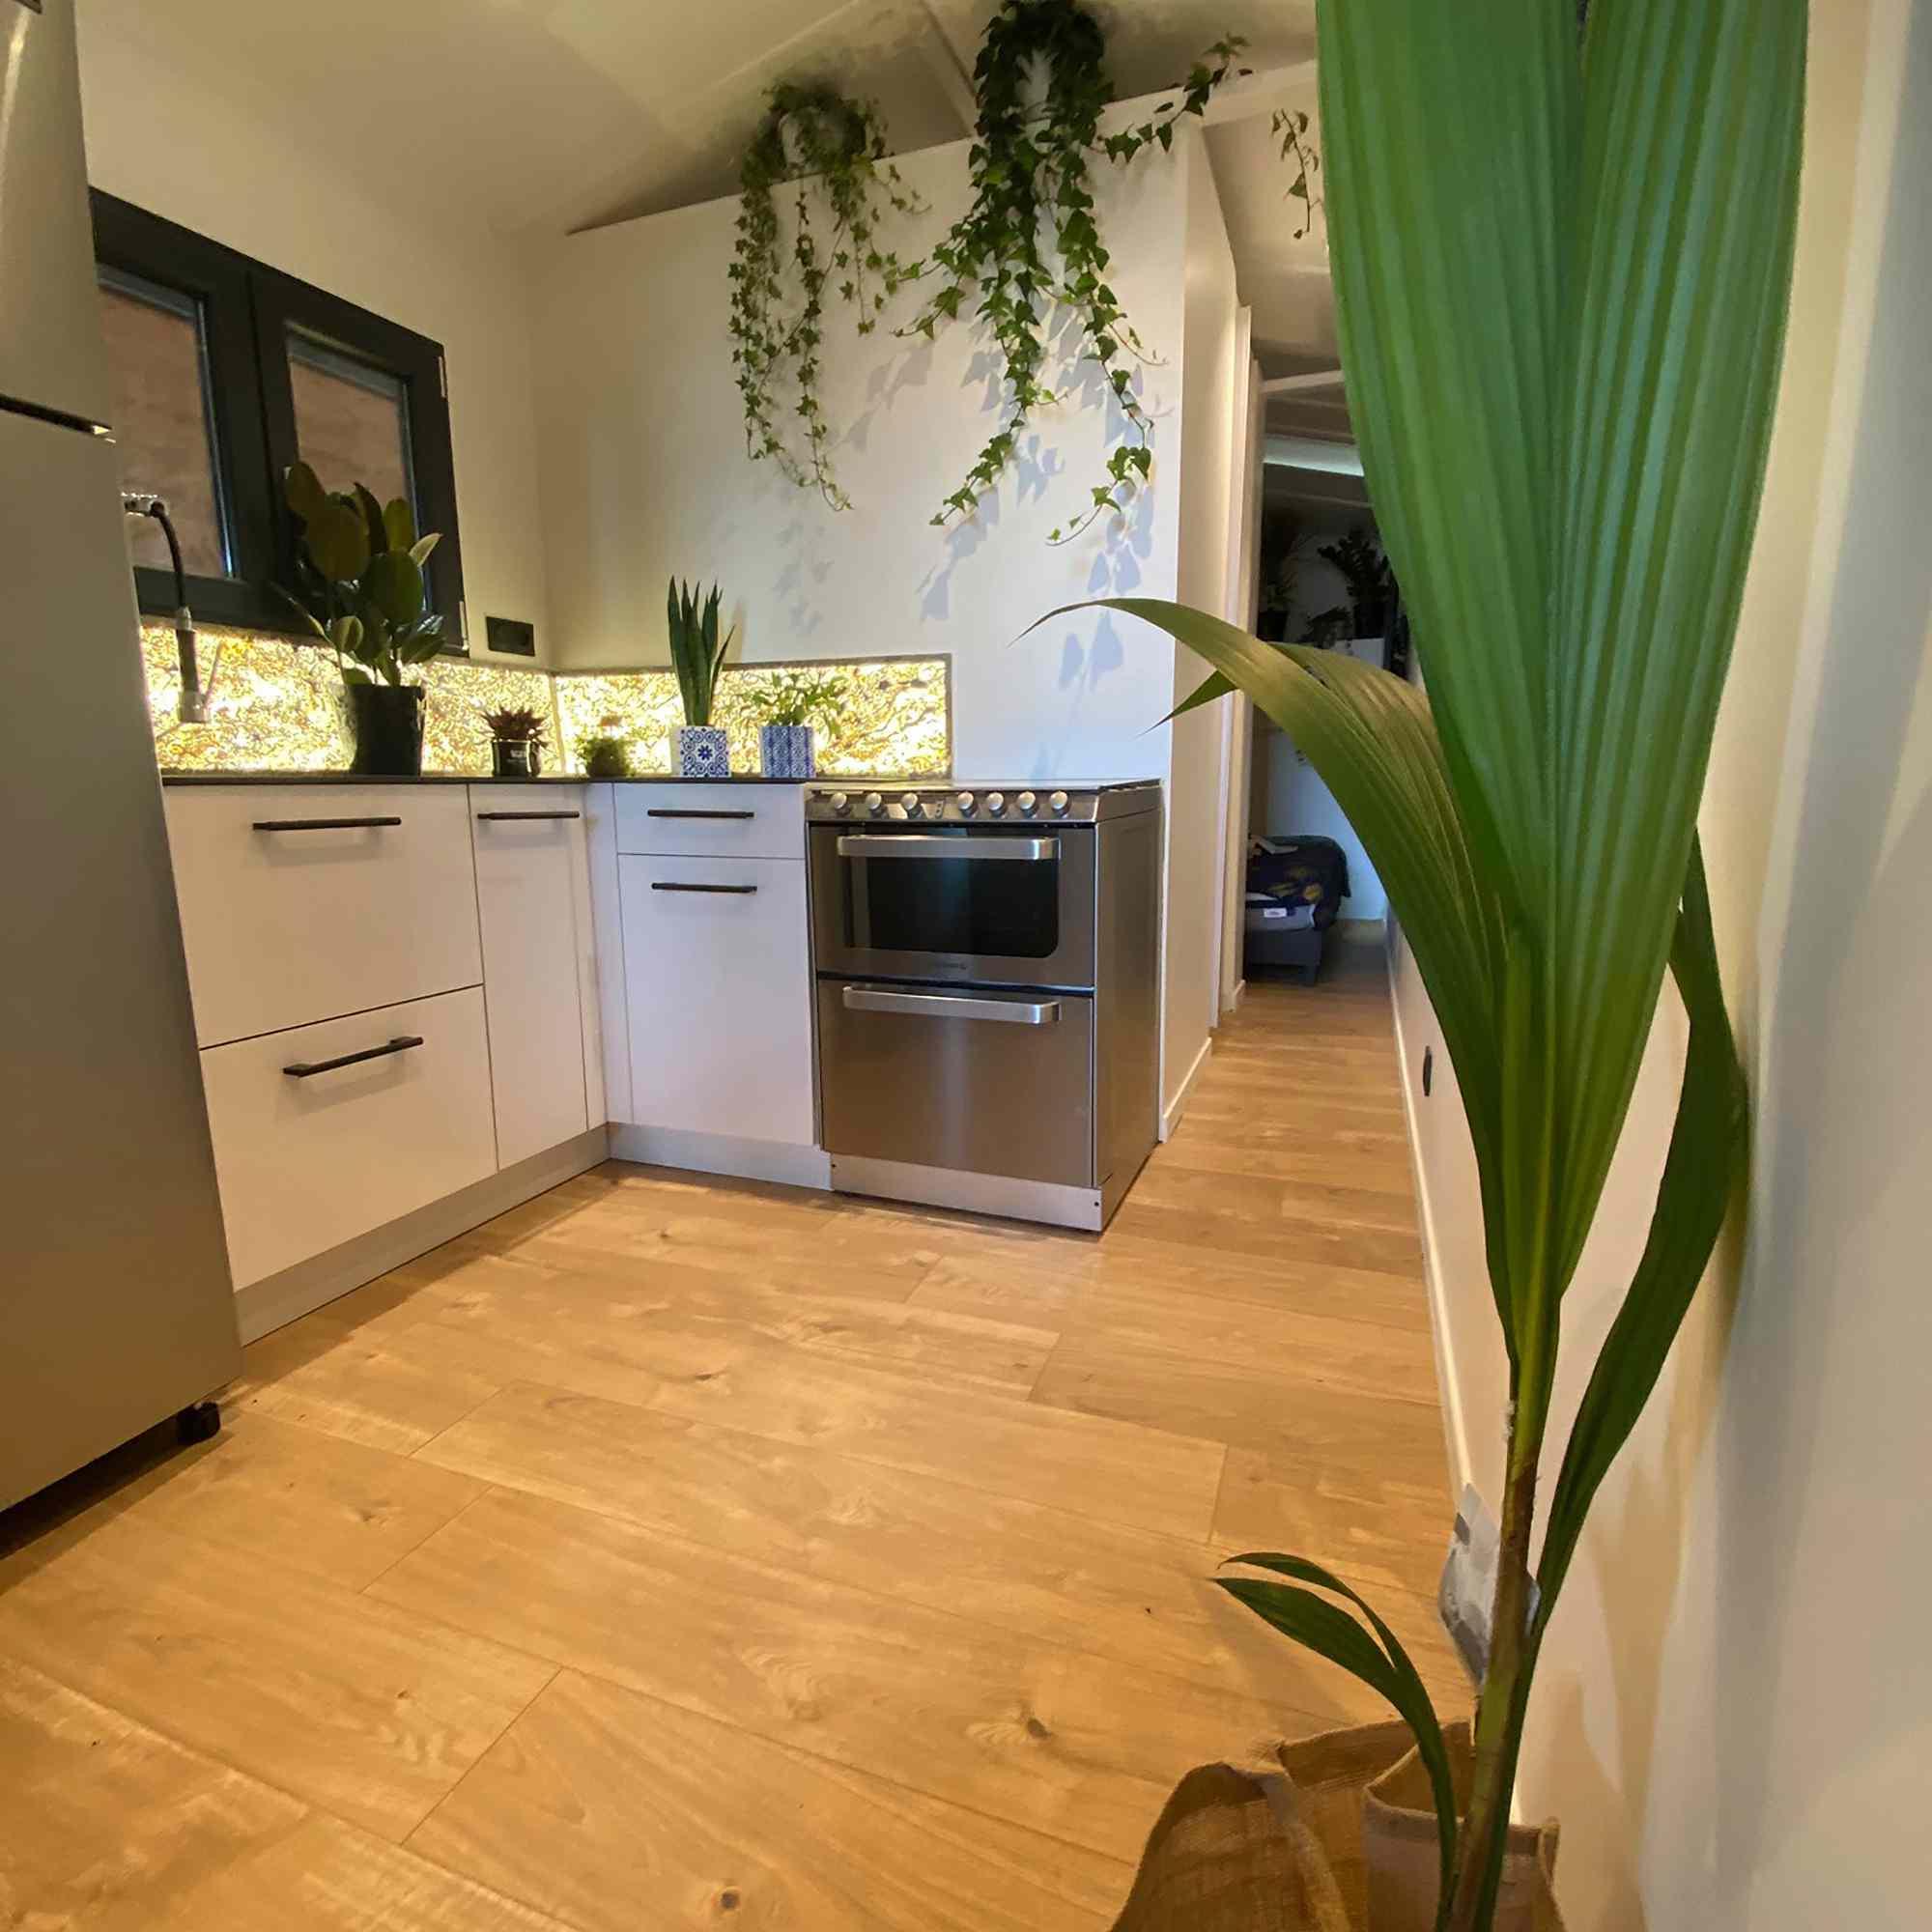 Dejessi tiny house by Tiny House Tarentaise kitchen